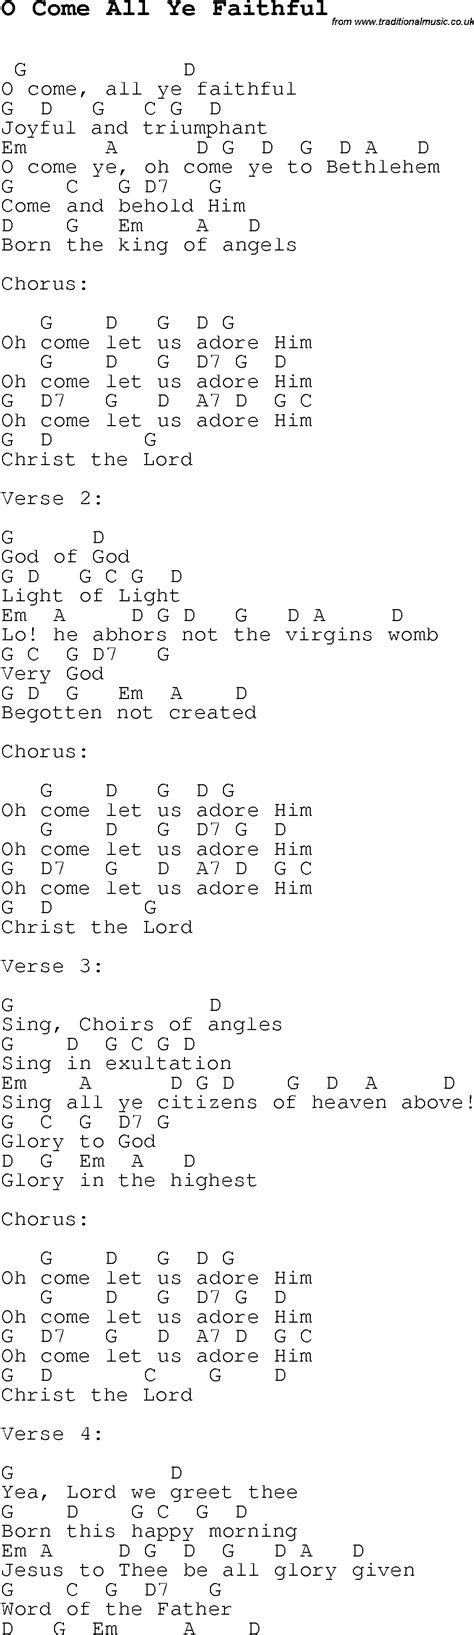 O Come All Ye Faithful Lyrics And Guitar Chords